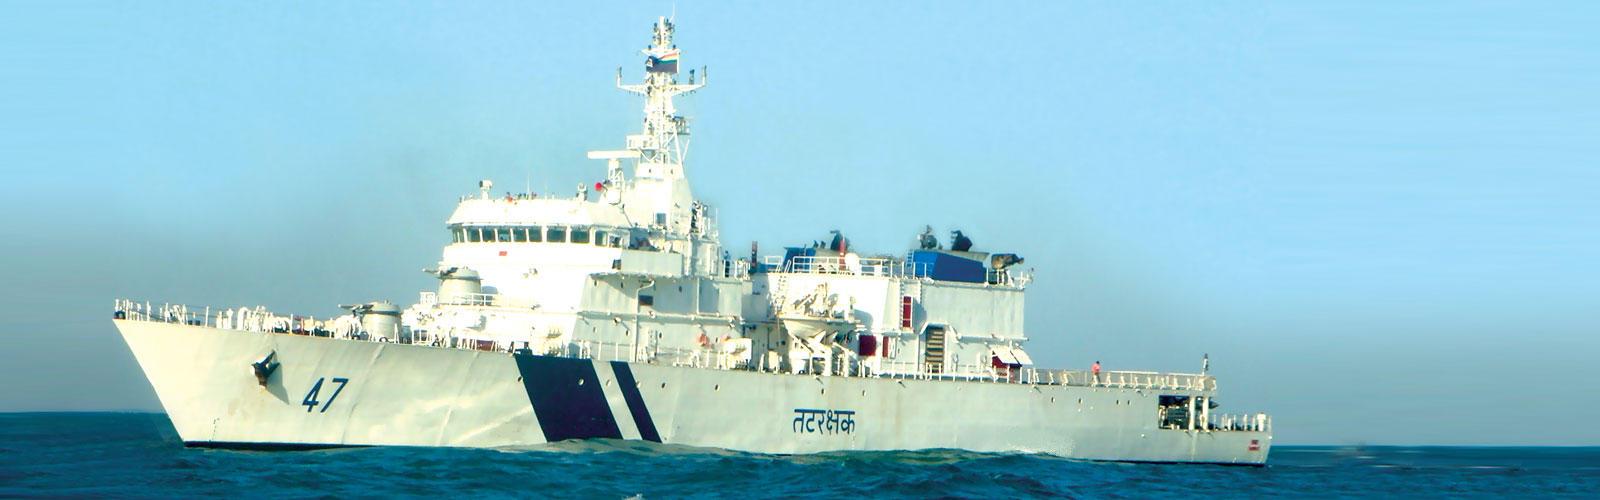 105 M. Advanced Offshore Patrol Vessel